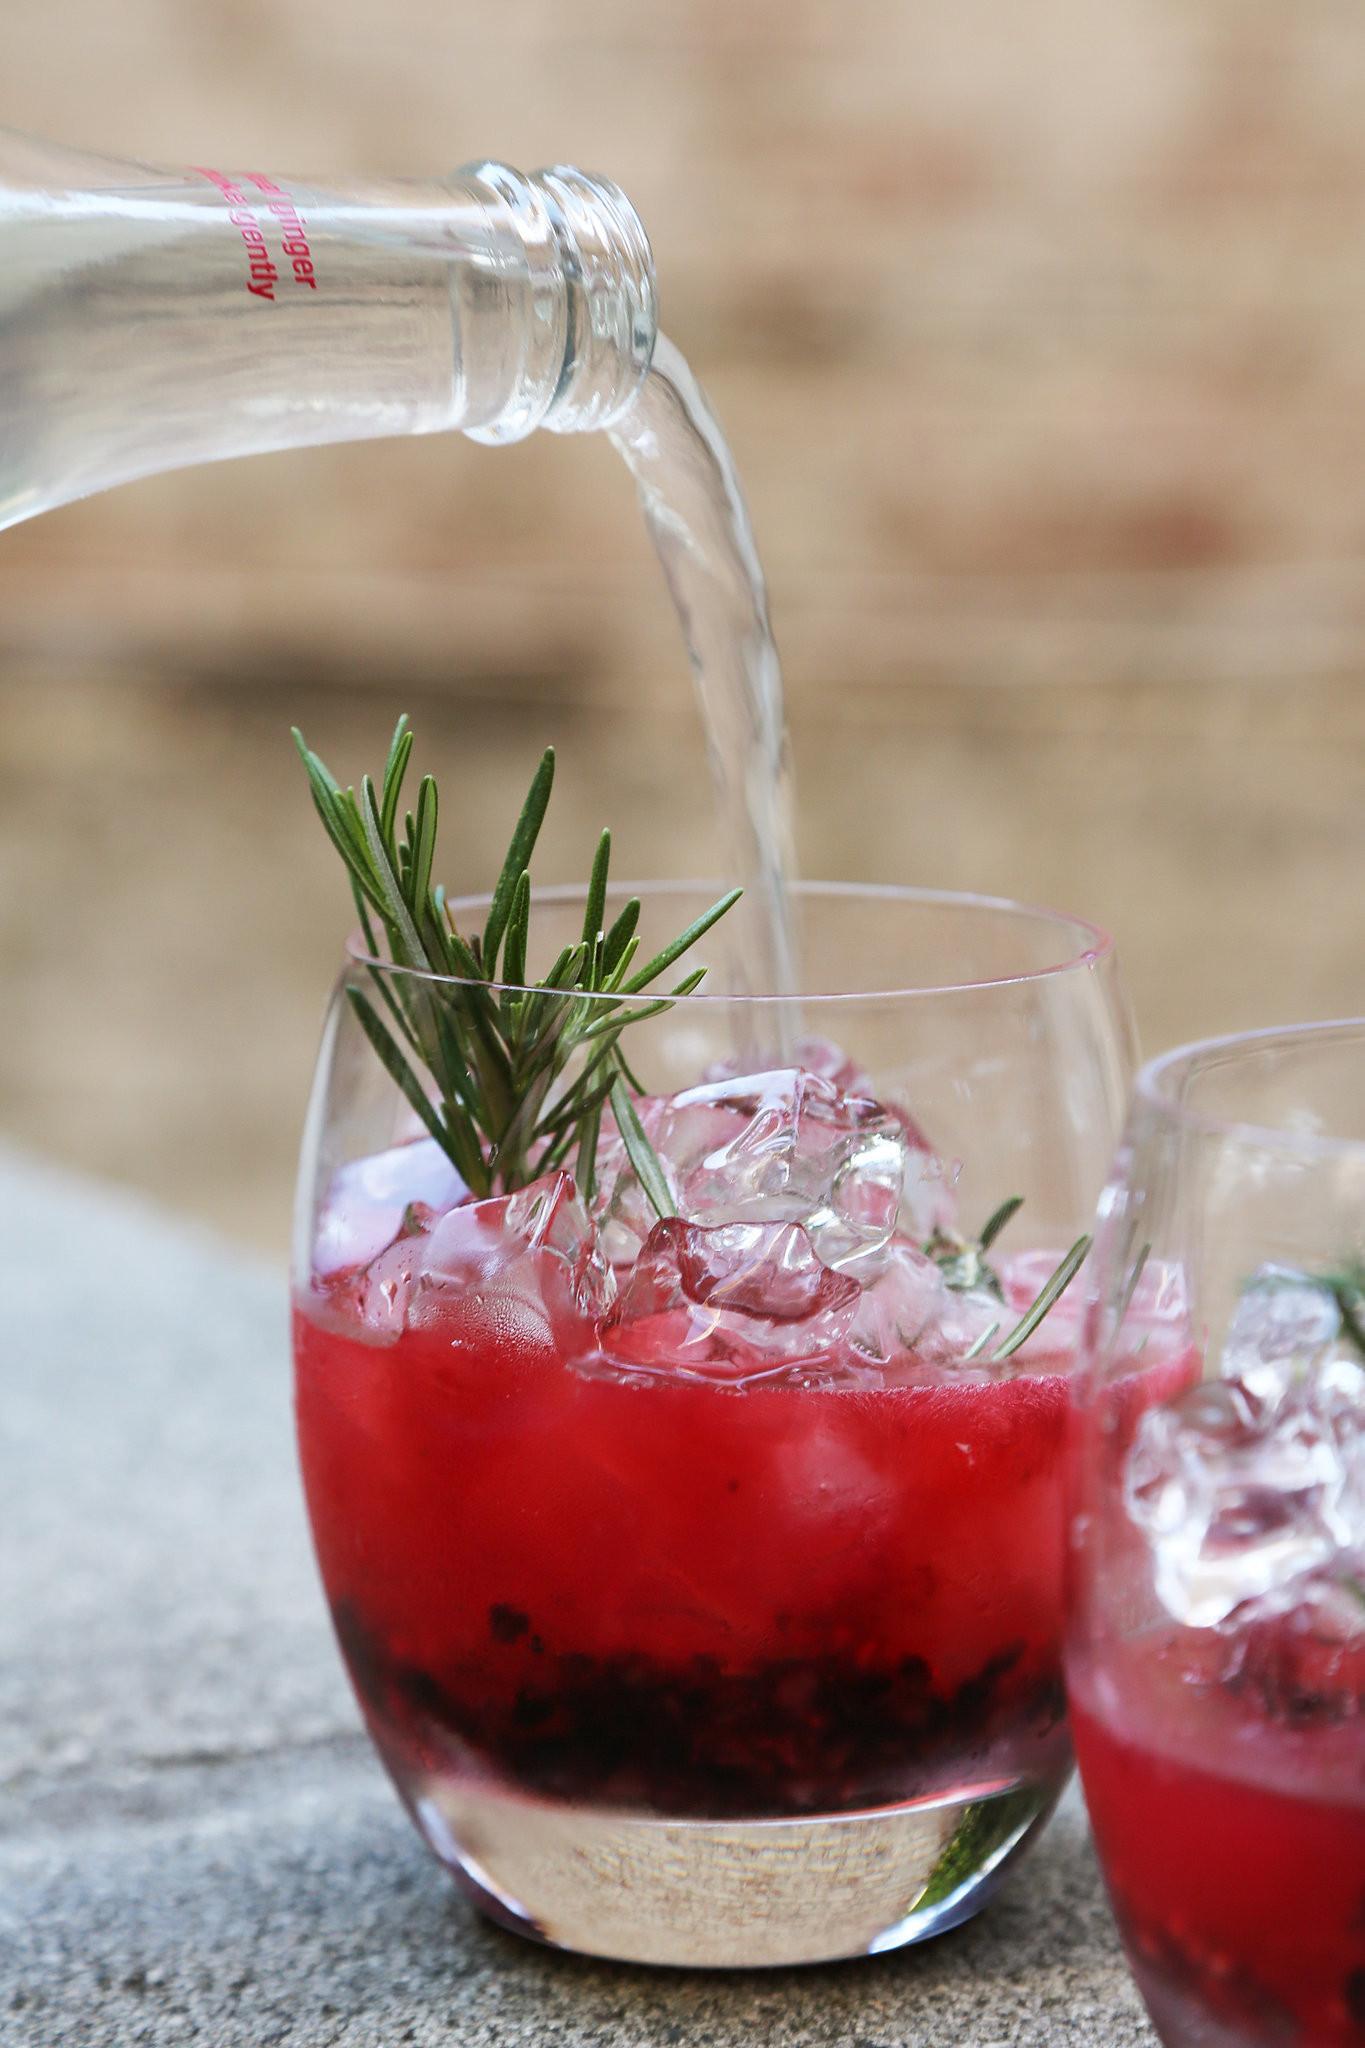 Summer Vodka Drinks Pitcher  Vodka Cocktail Recipe With Fresh Berries